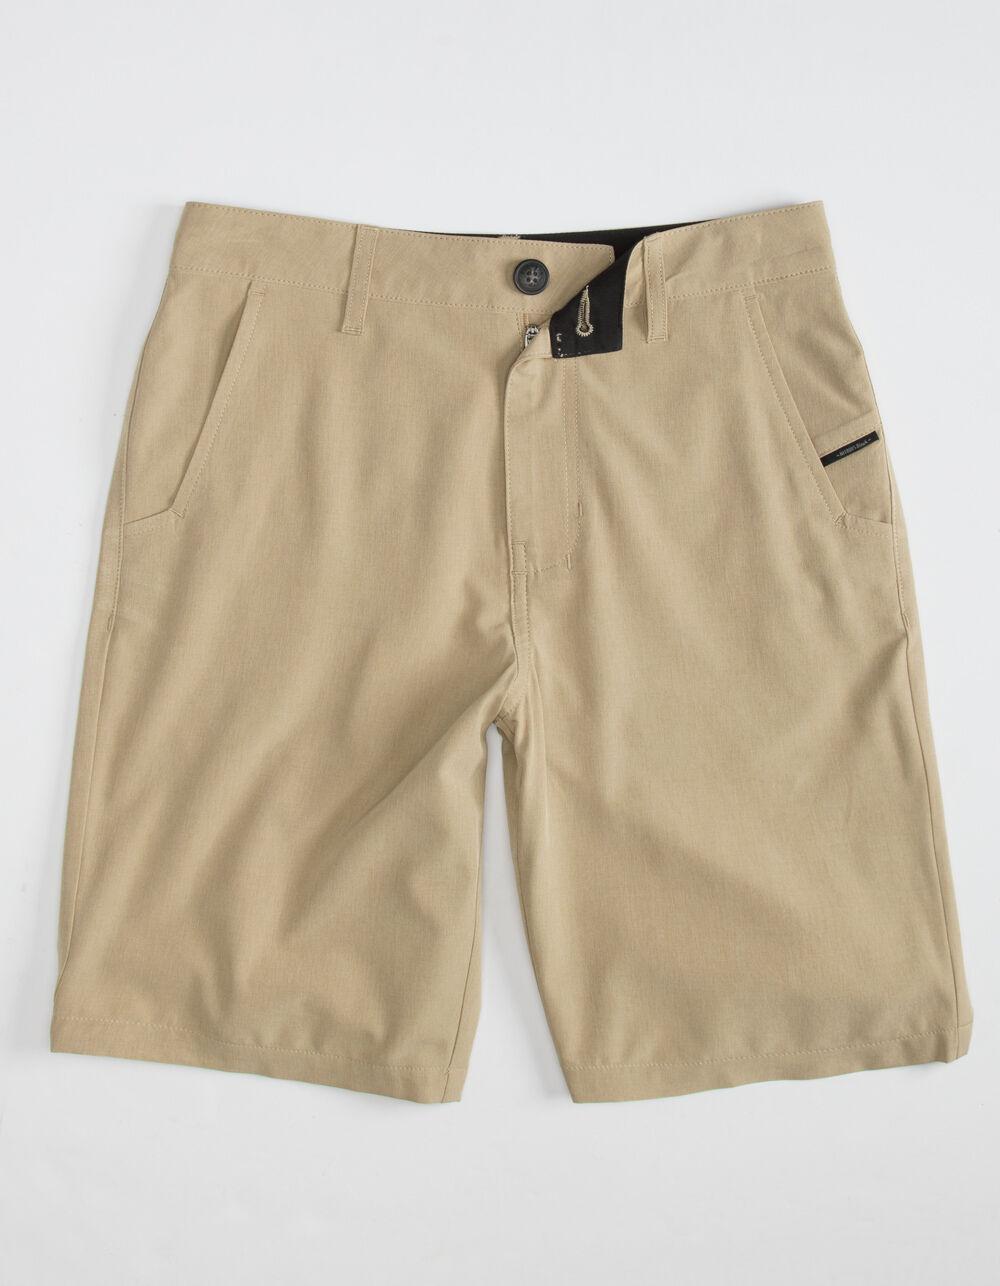 NITROUS BLACK Format Boys Dark Khaki Hybrid Shorts